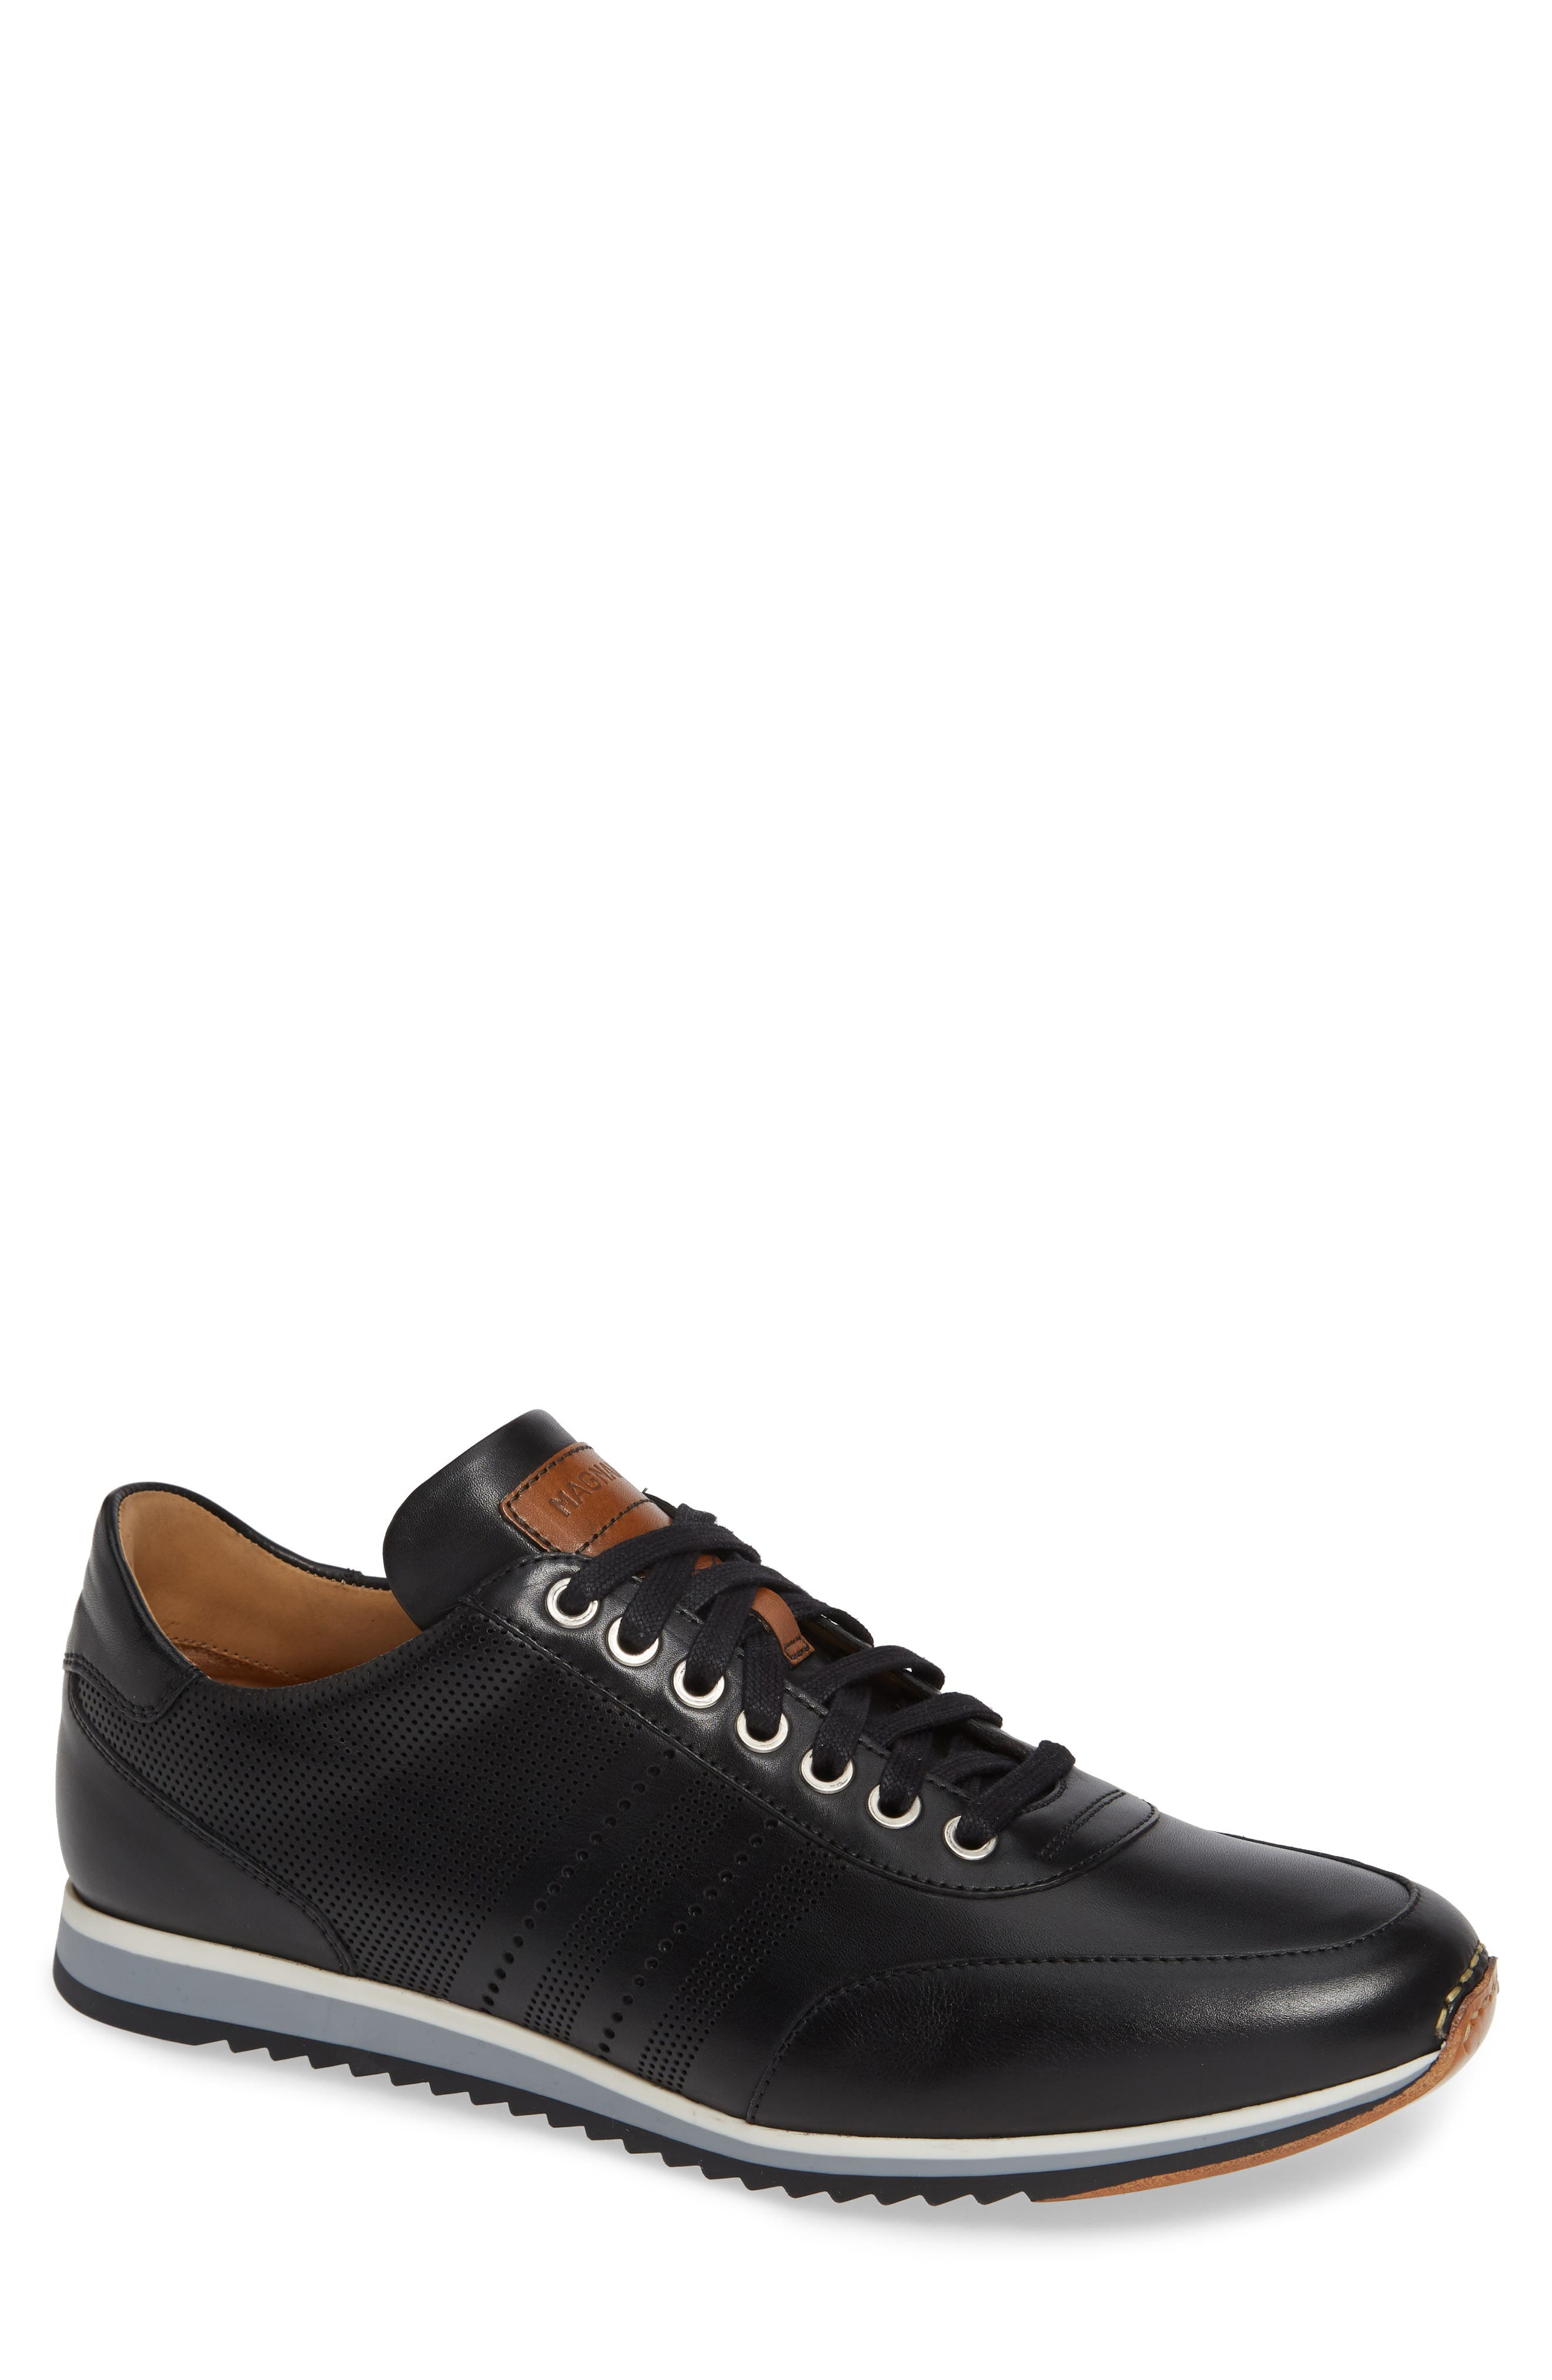 Merino Sneaker,                             Main thumbnail 1, color,                             BLACK LEATHER